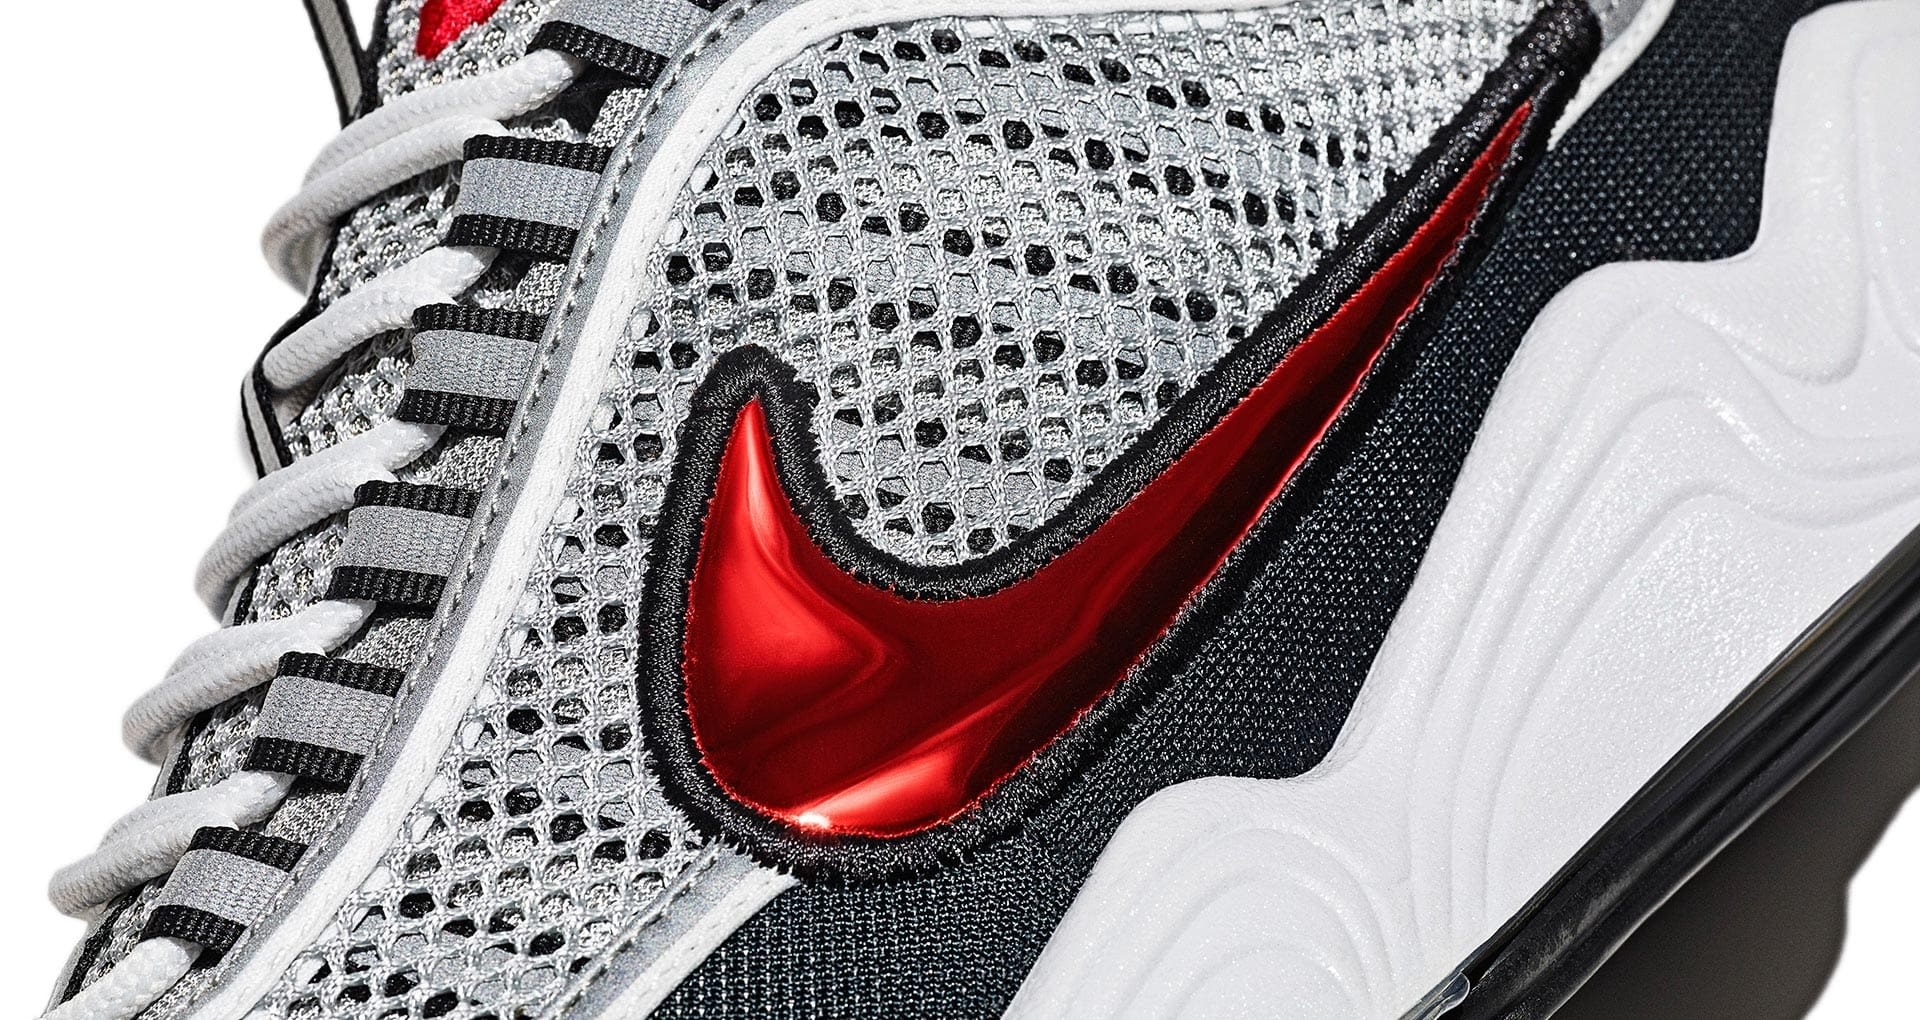 Nike Air Zoom Spiridon 'Silver & Red' Release Date. Nike